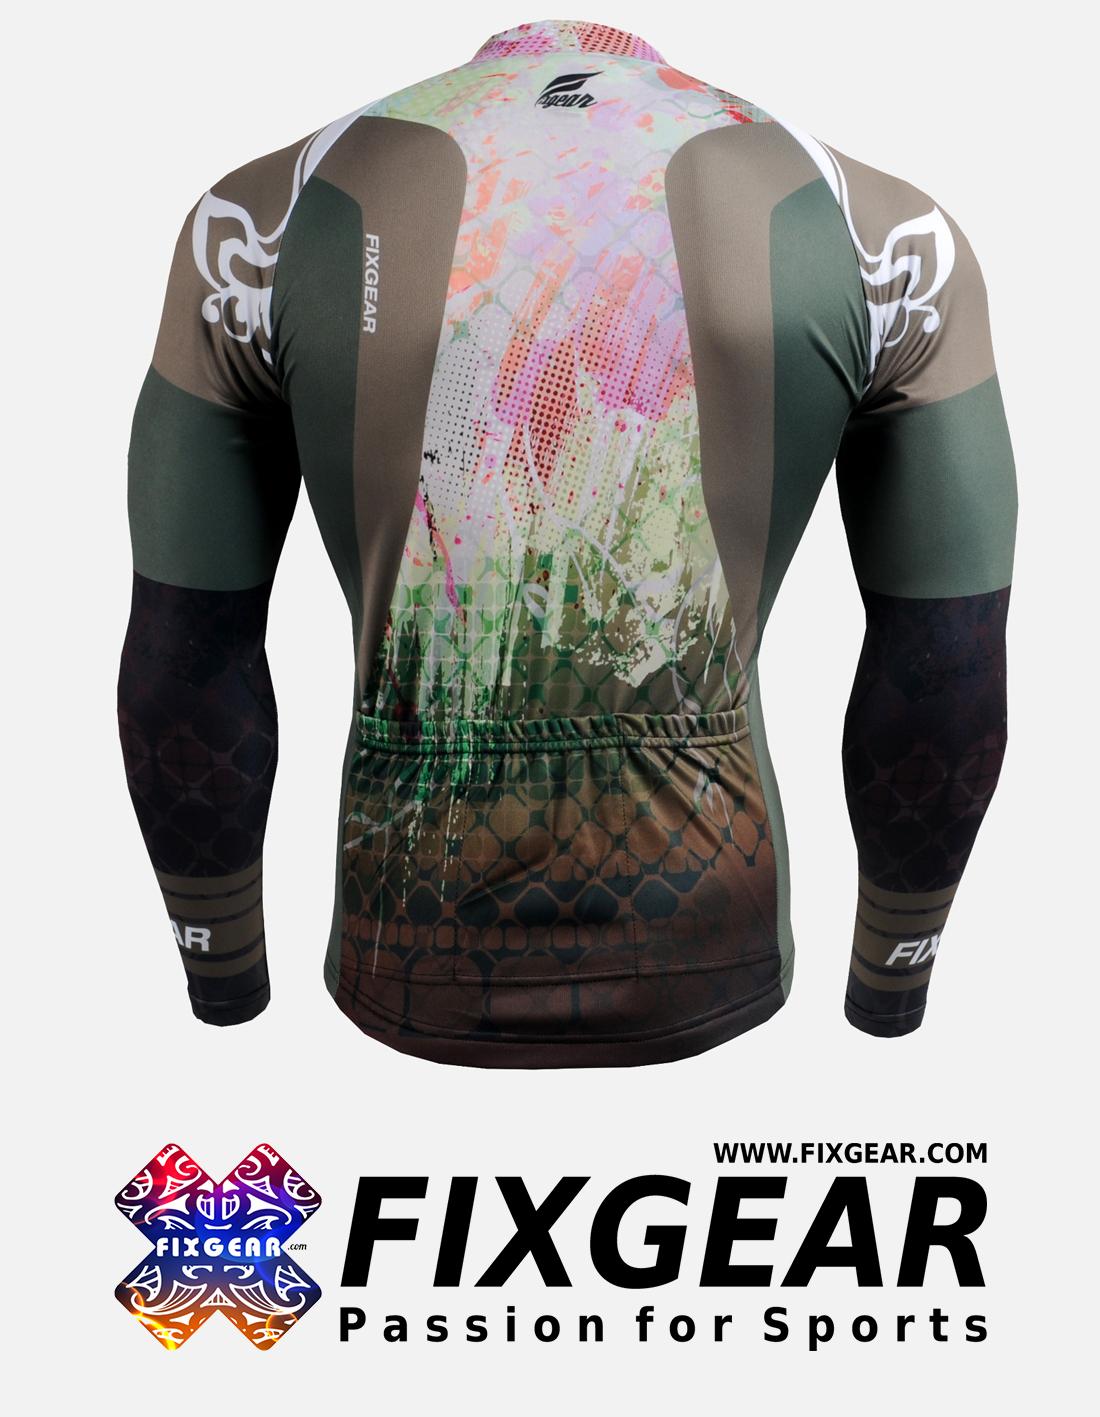 FIXGEAR CS-4201 Men's Cycling Jersey Long Sleeve